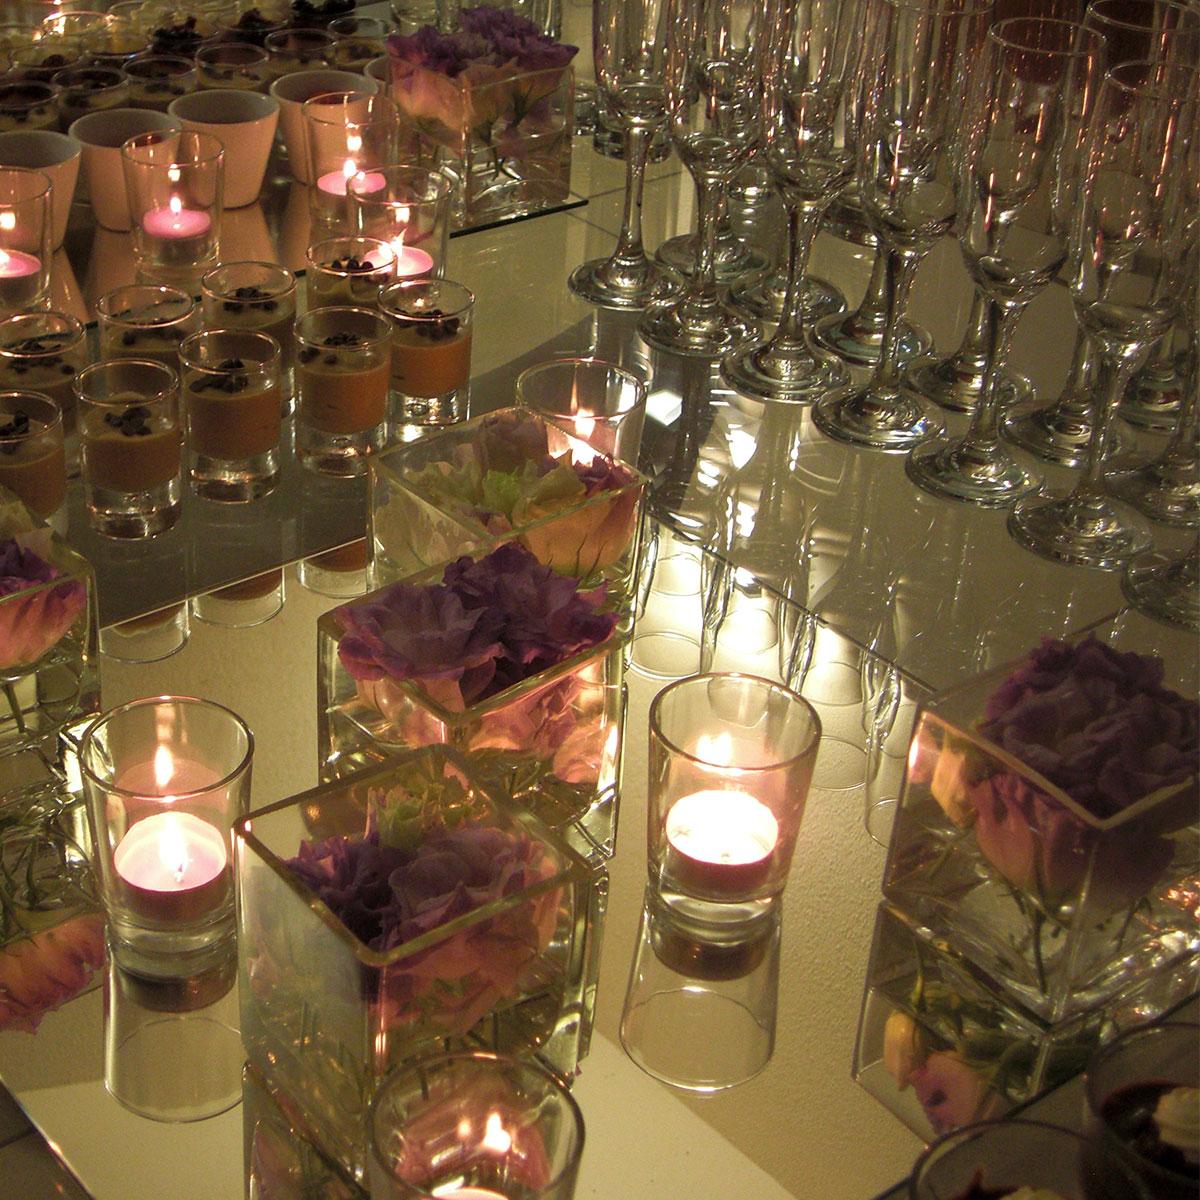 Centrotavola con candele | Negriricevimenti.com